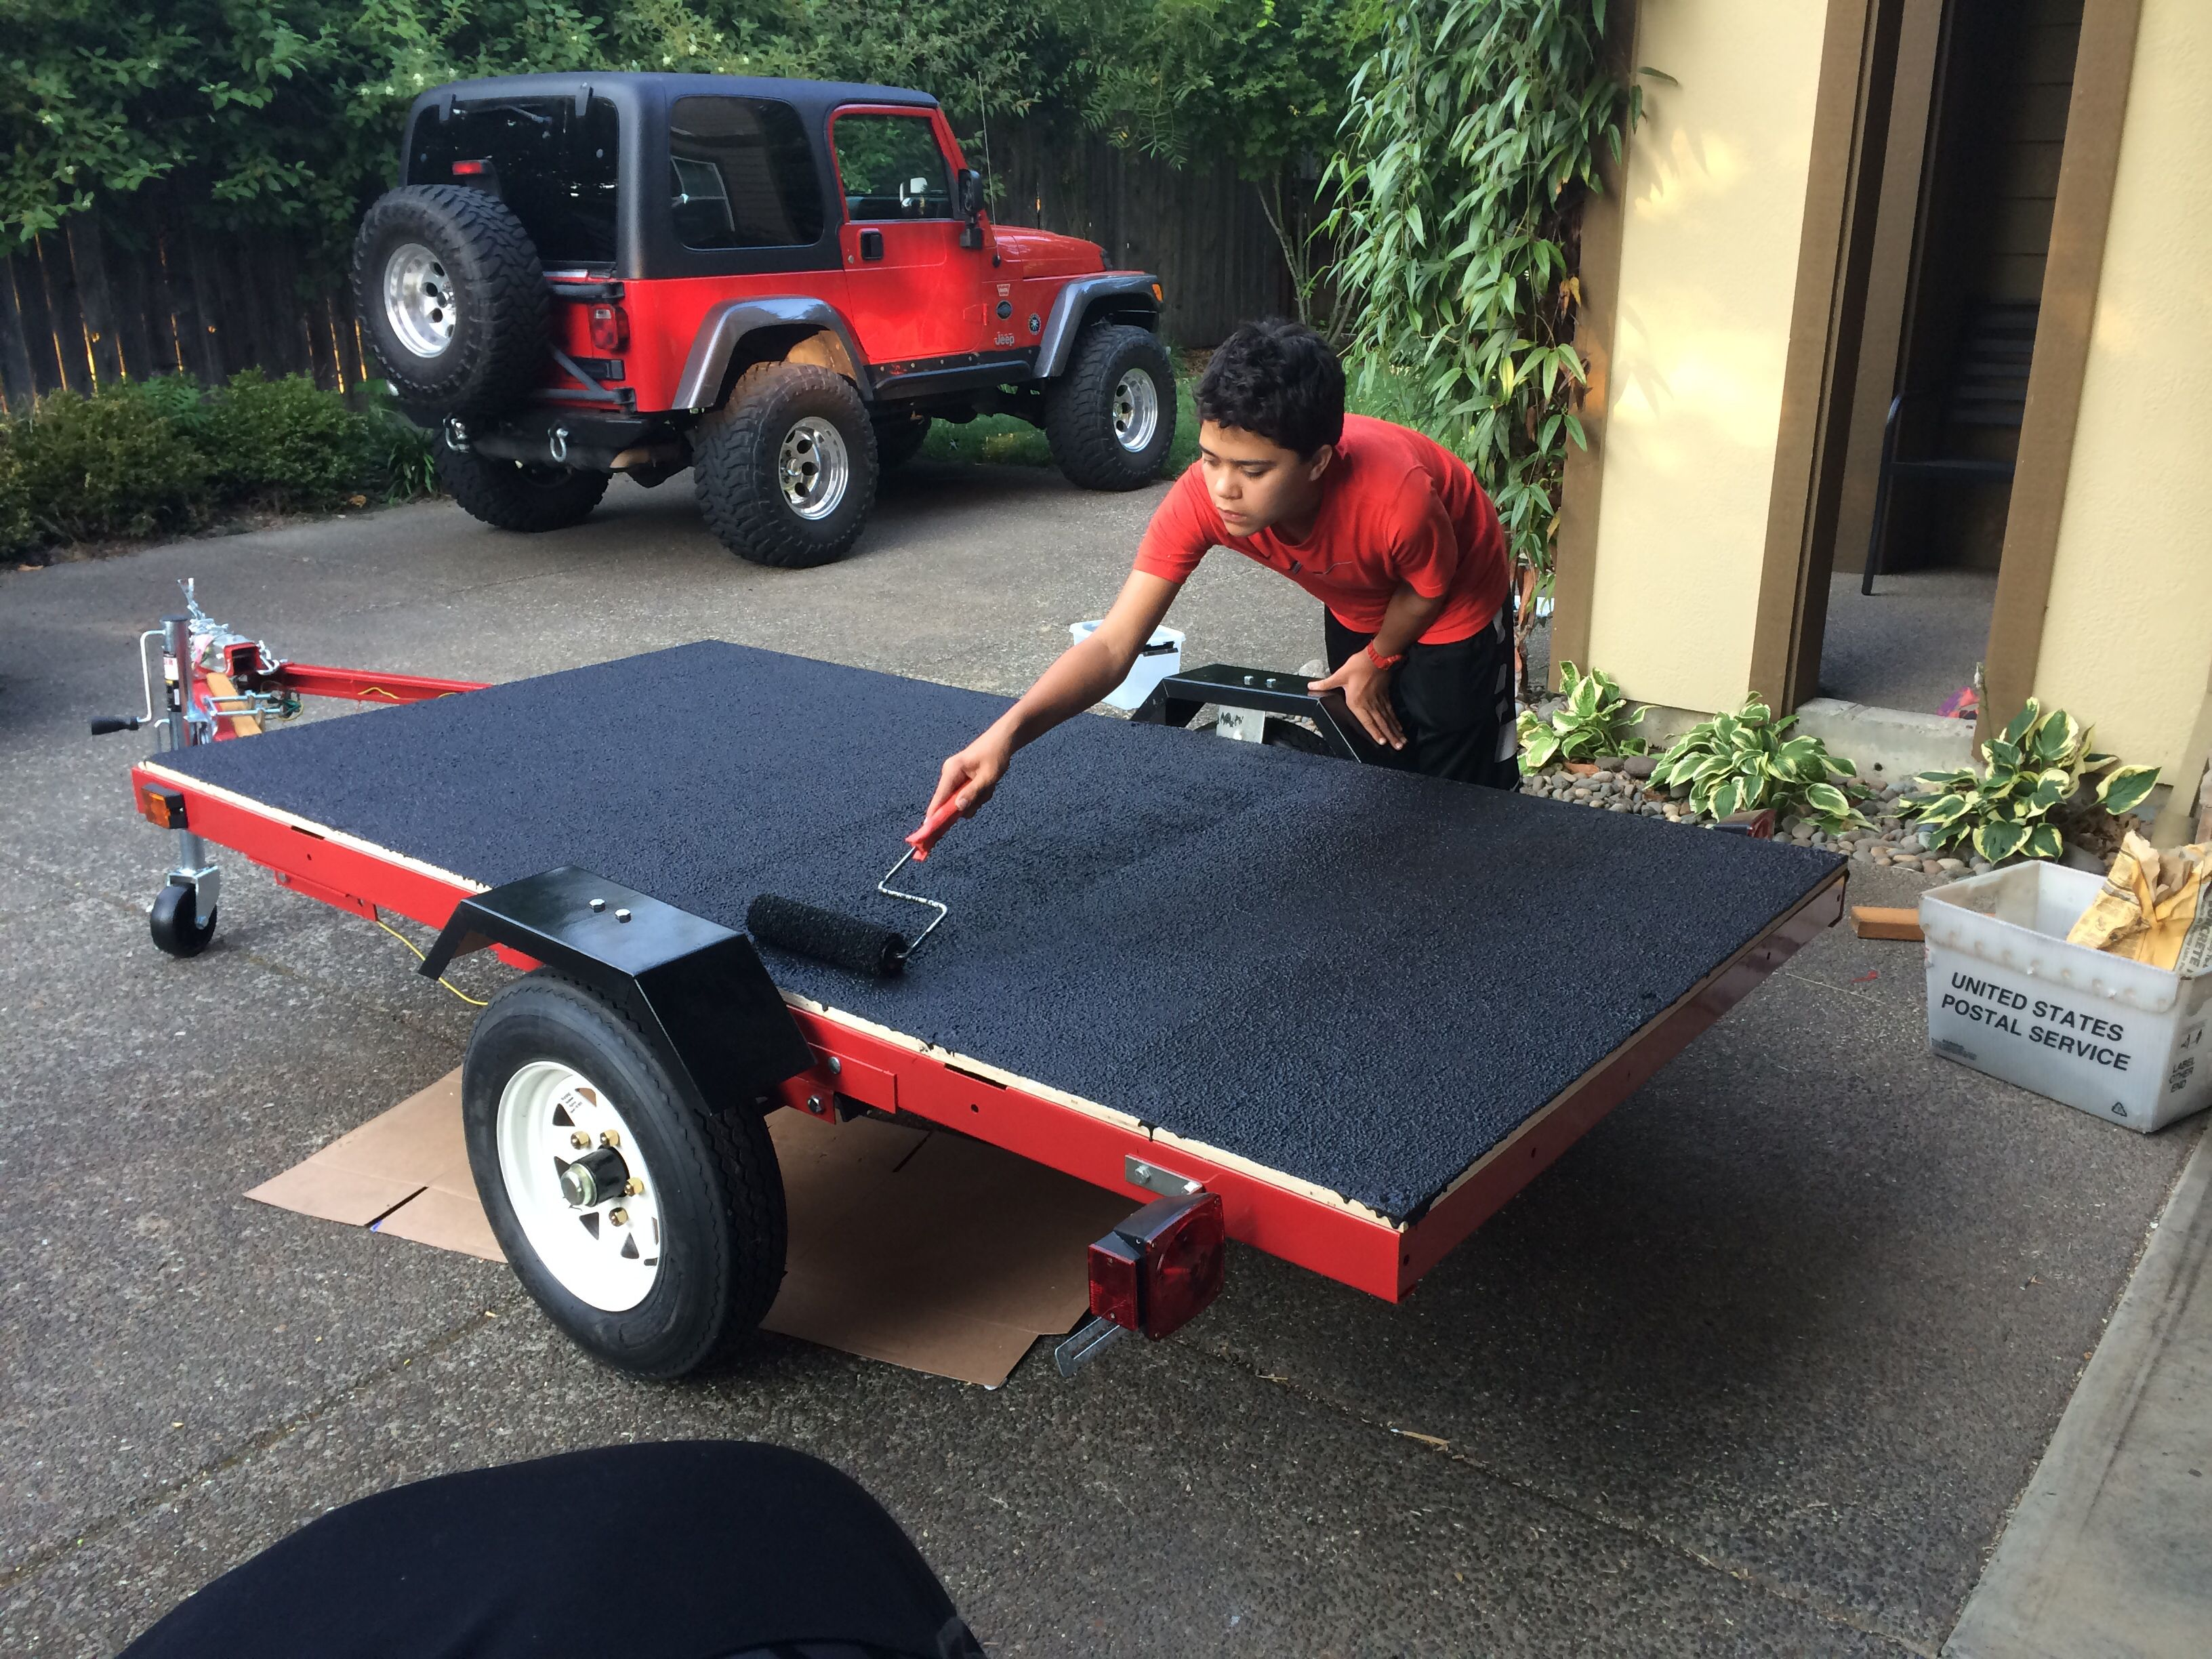 Harbor Freight Trailer With Deck Concrete Restore 10x Rust Oleum